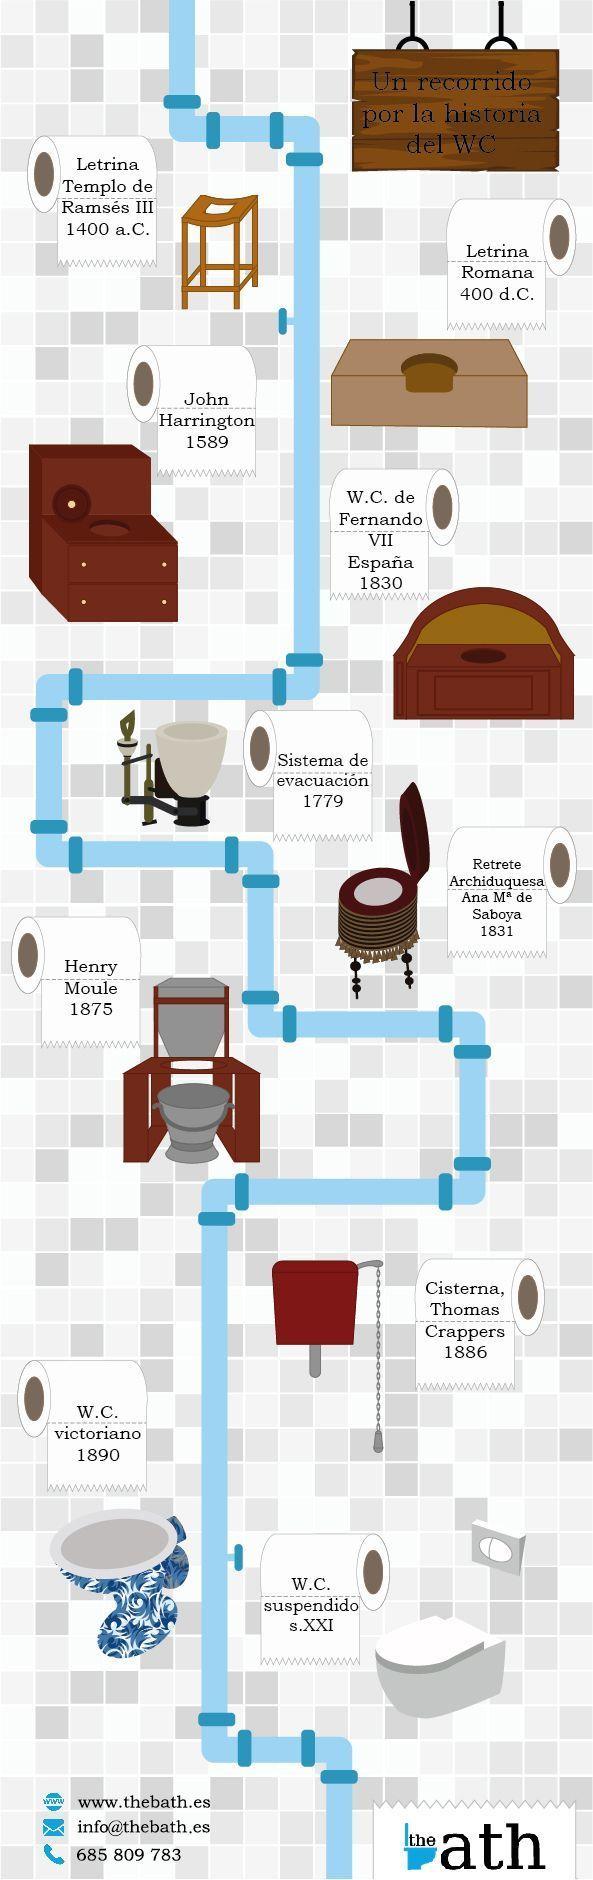 infografia_thebath